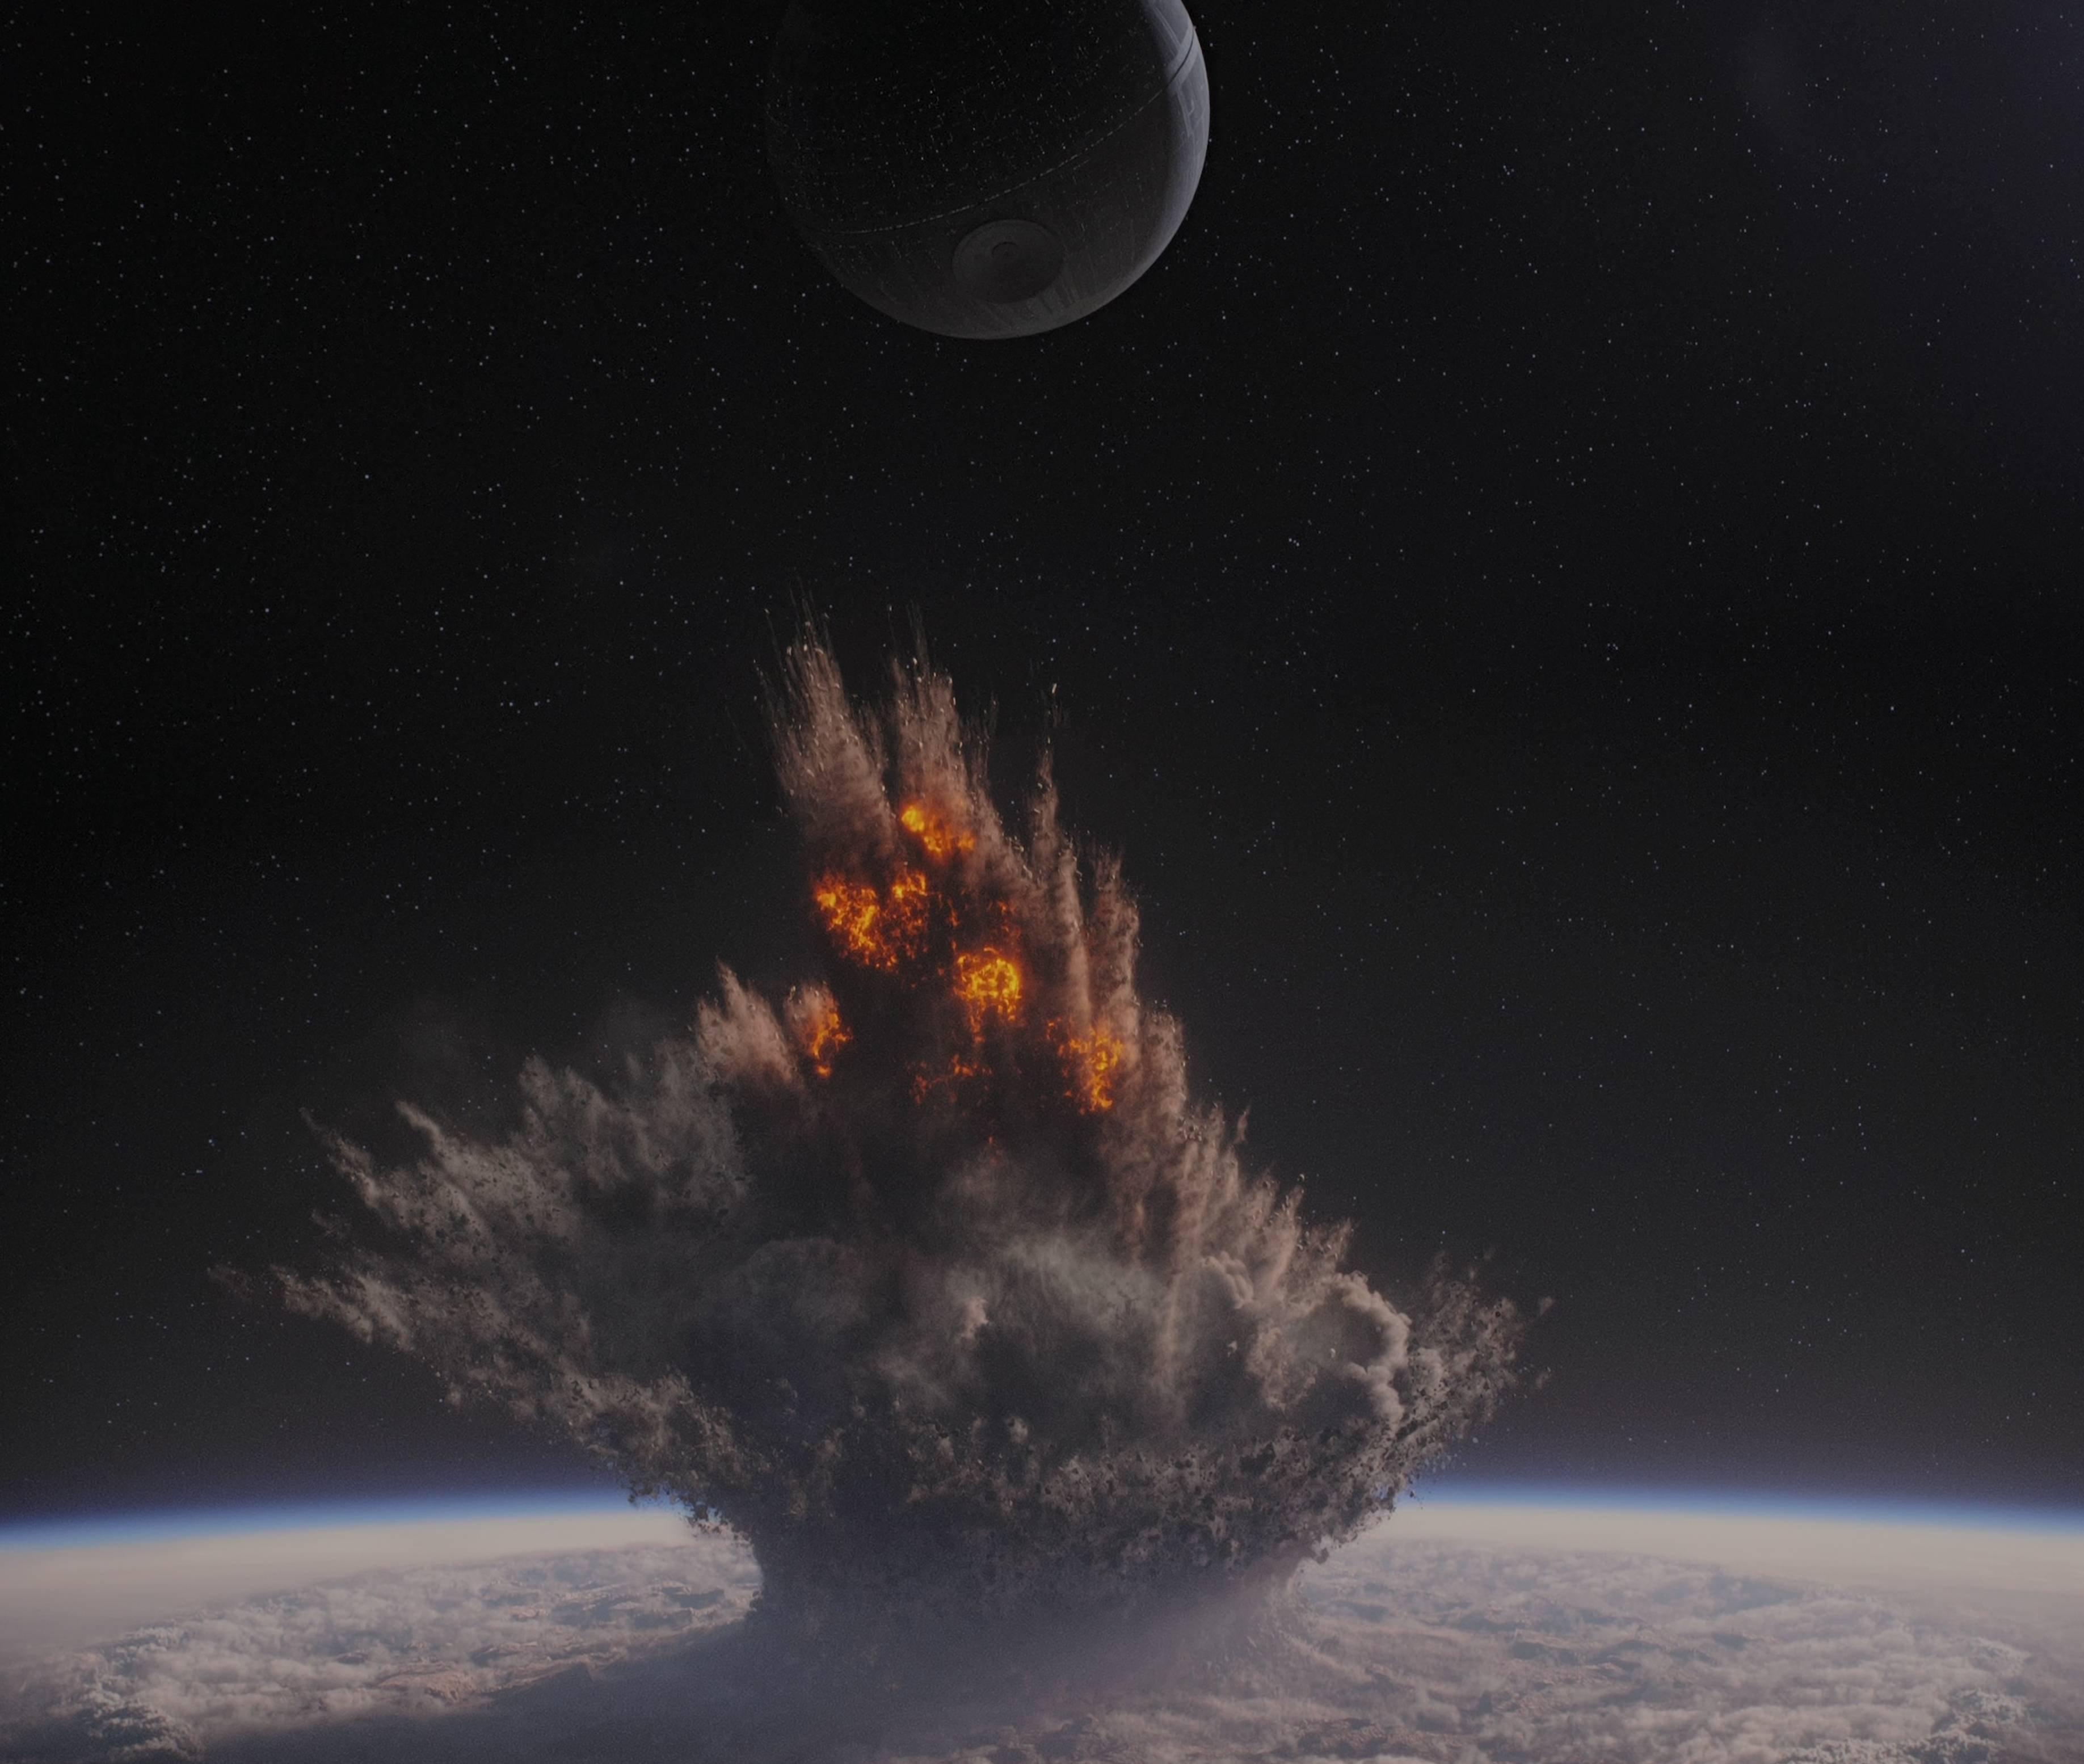 Wallpaper Star Wars planet vehicle Earth space art